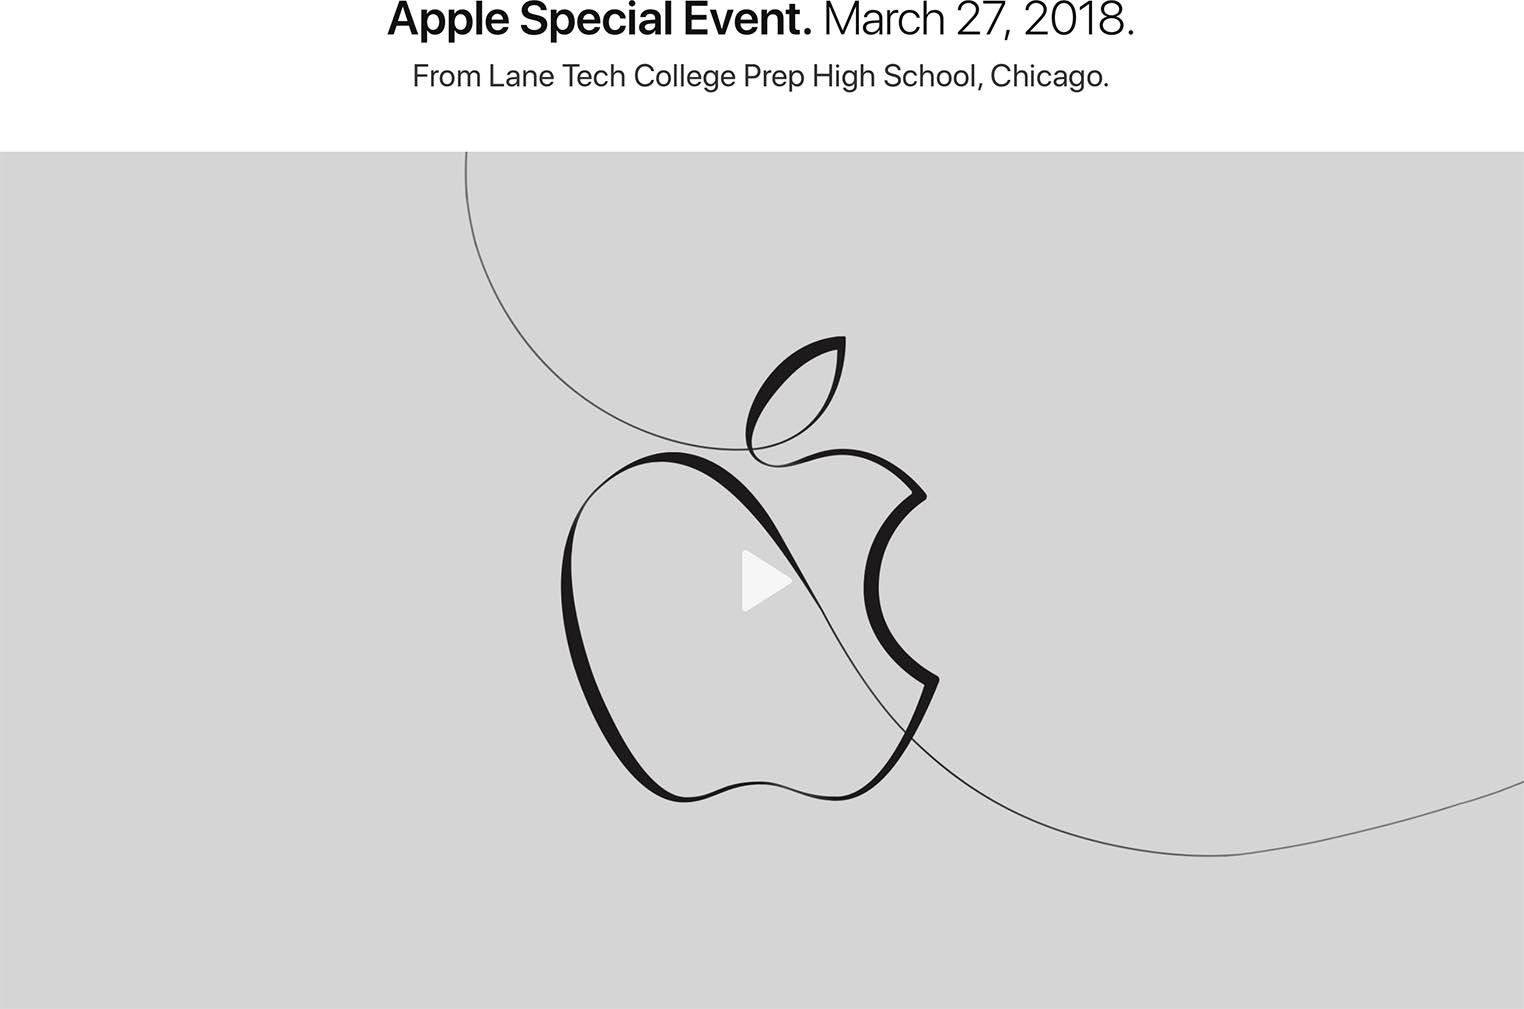 Apple Event mars 2018 vidéo